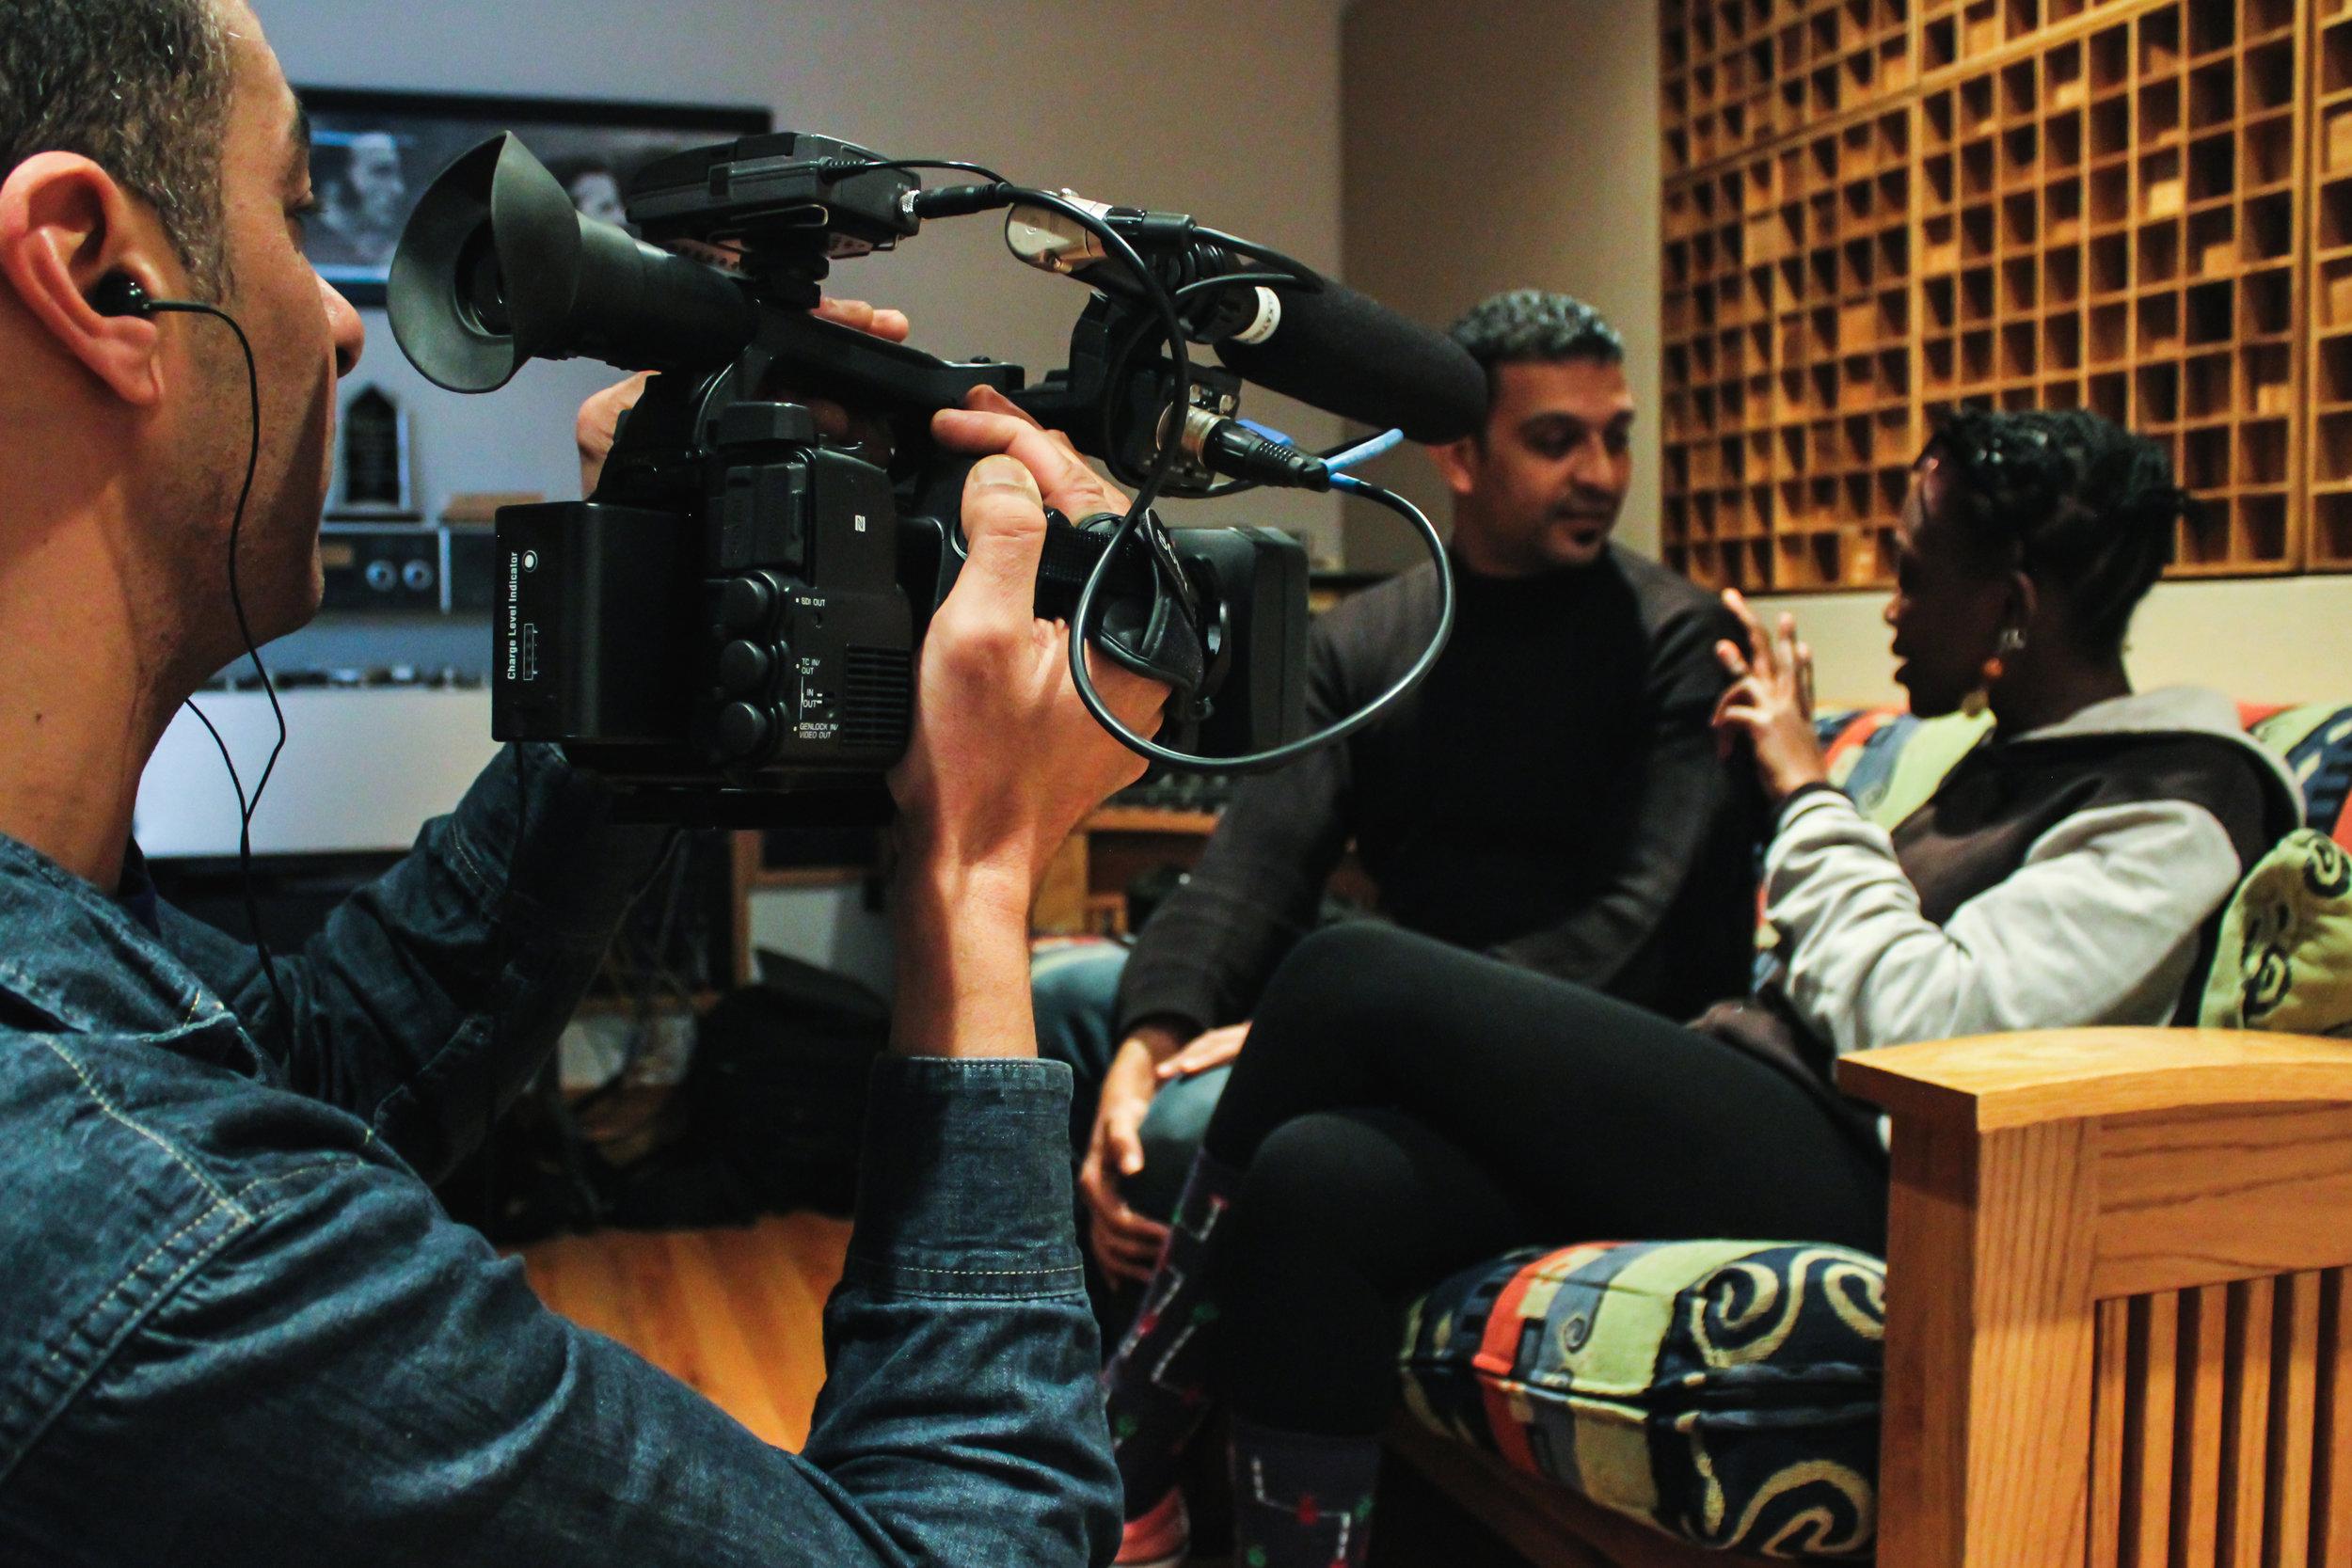 Sherief Elkatsha films Nader ElShaer and Kasiva Mutua